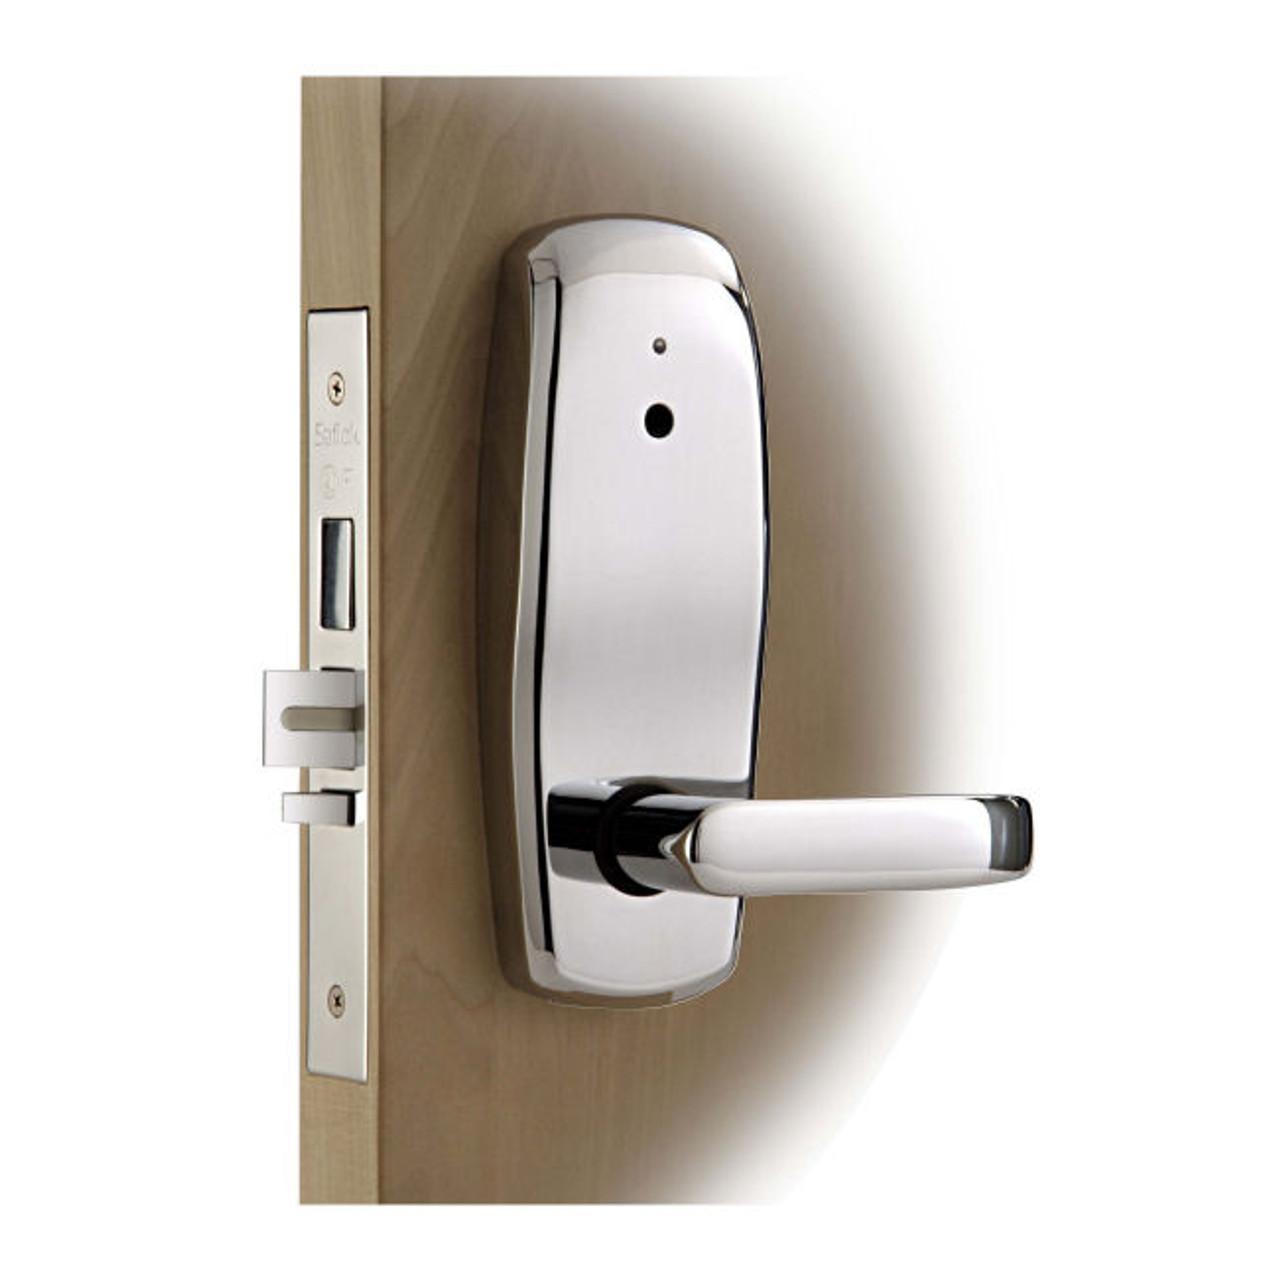 INSYNC M - RFID MORTISE - RM DOOR LOCK